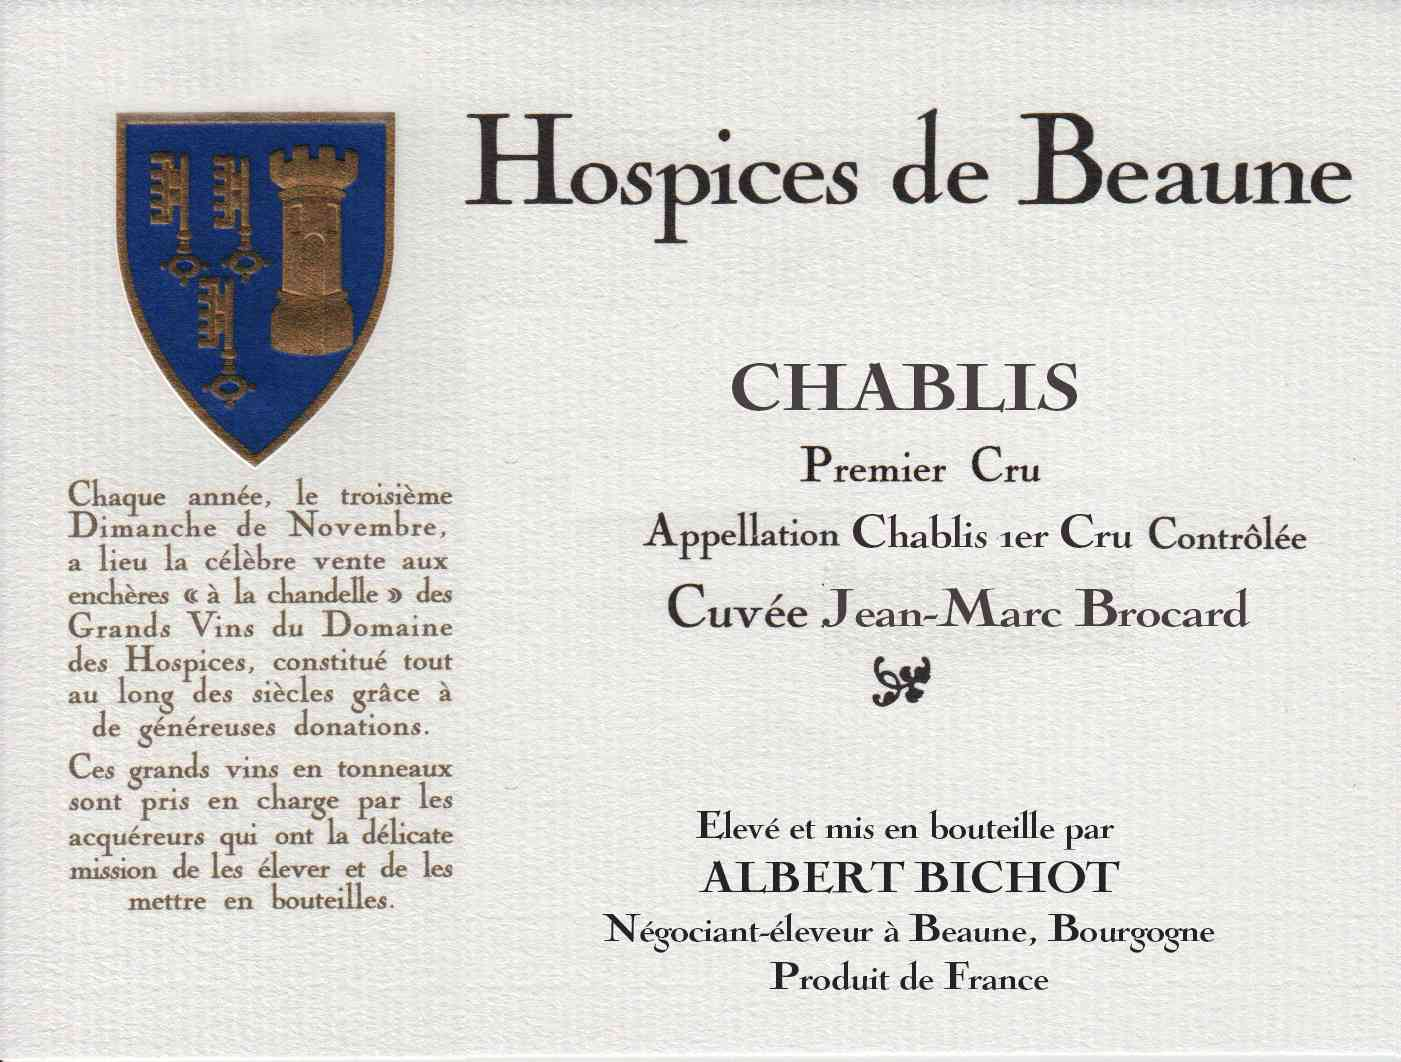 Encheres-auction-HospicesdeBeaune-AlbertBichot-ChablisPremierCru-Cuvee-JeanMarcBrocard